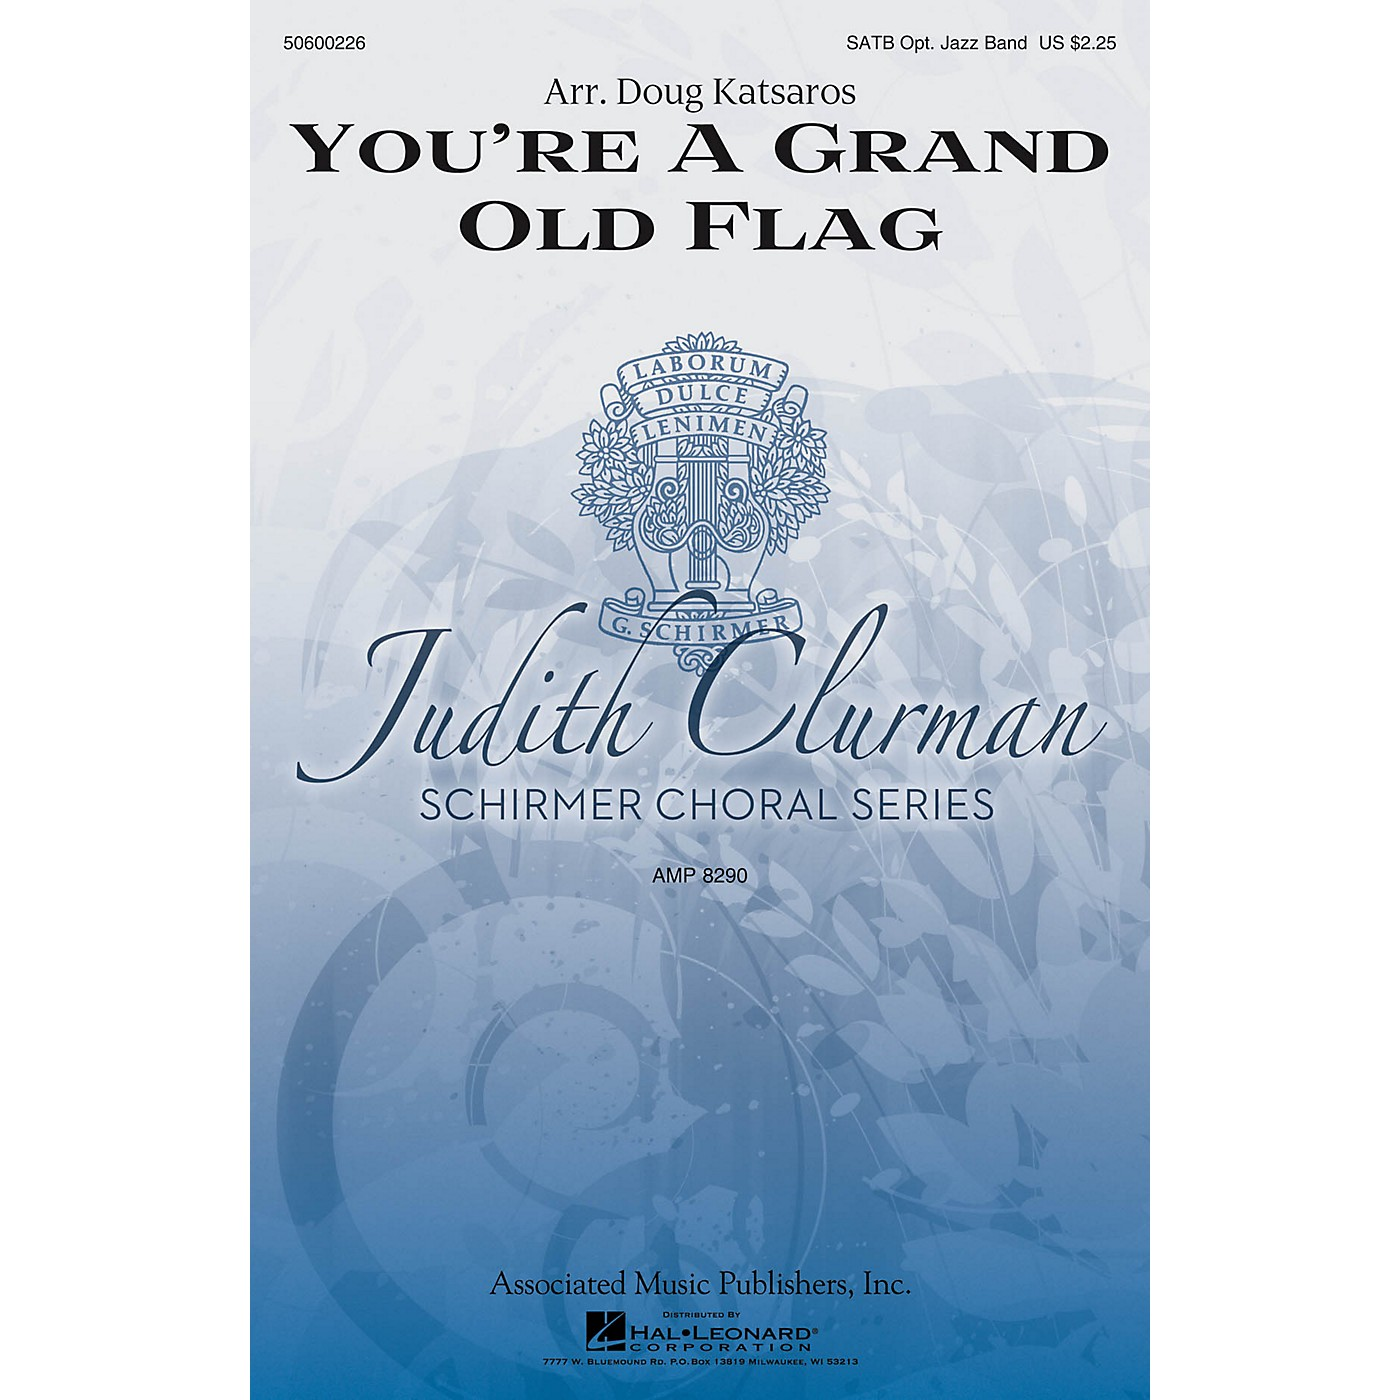 G. Schirmer You're a Grand Old Flag (Judith Clurman Choral Series) SATB arranged by Doug Katsaros thumbnail